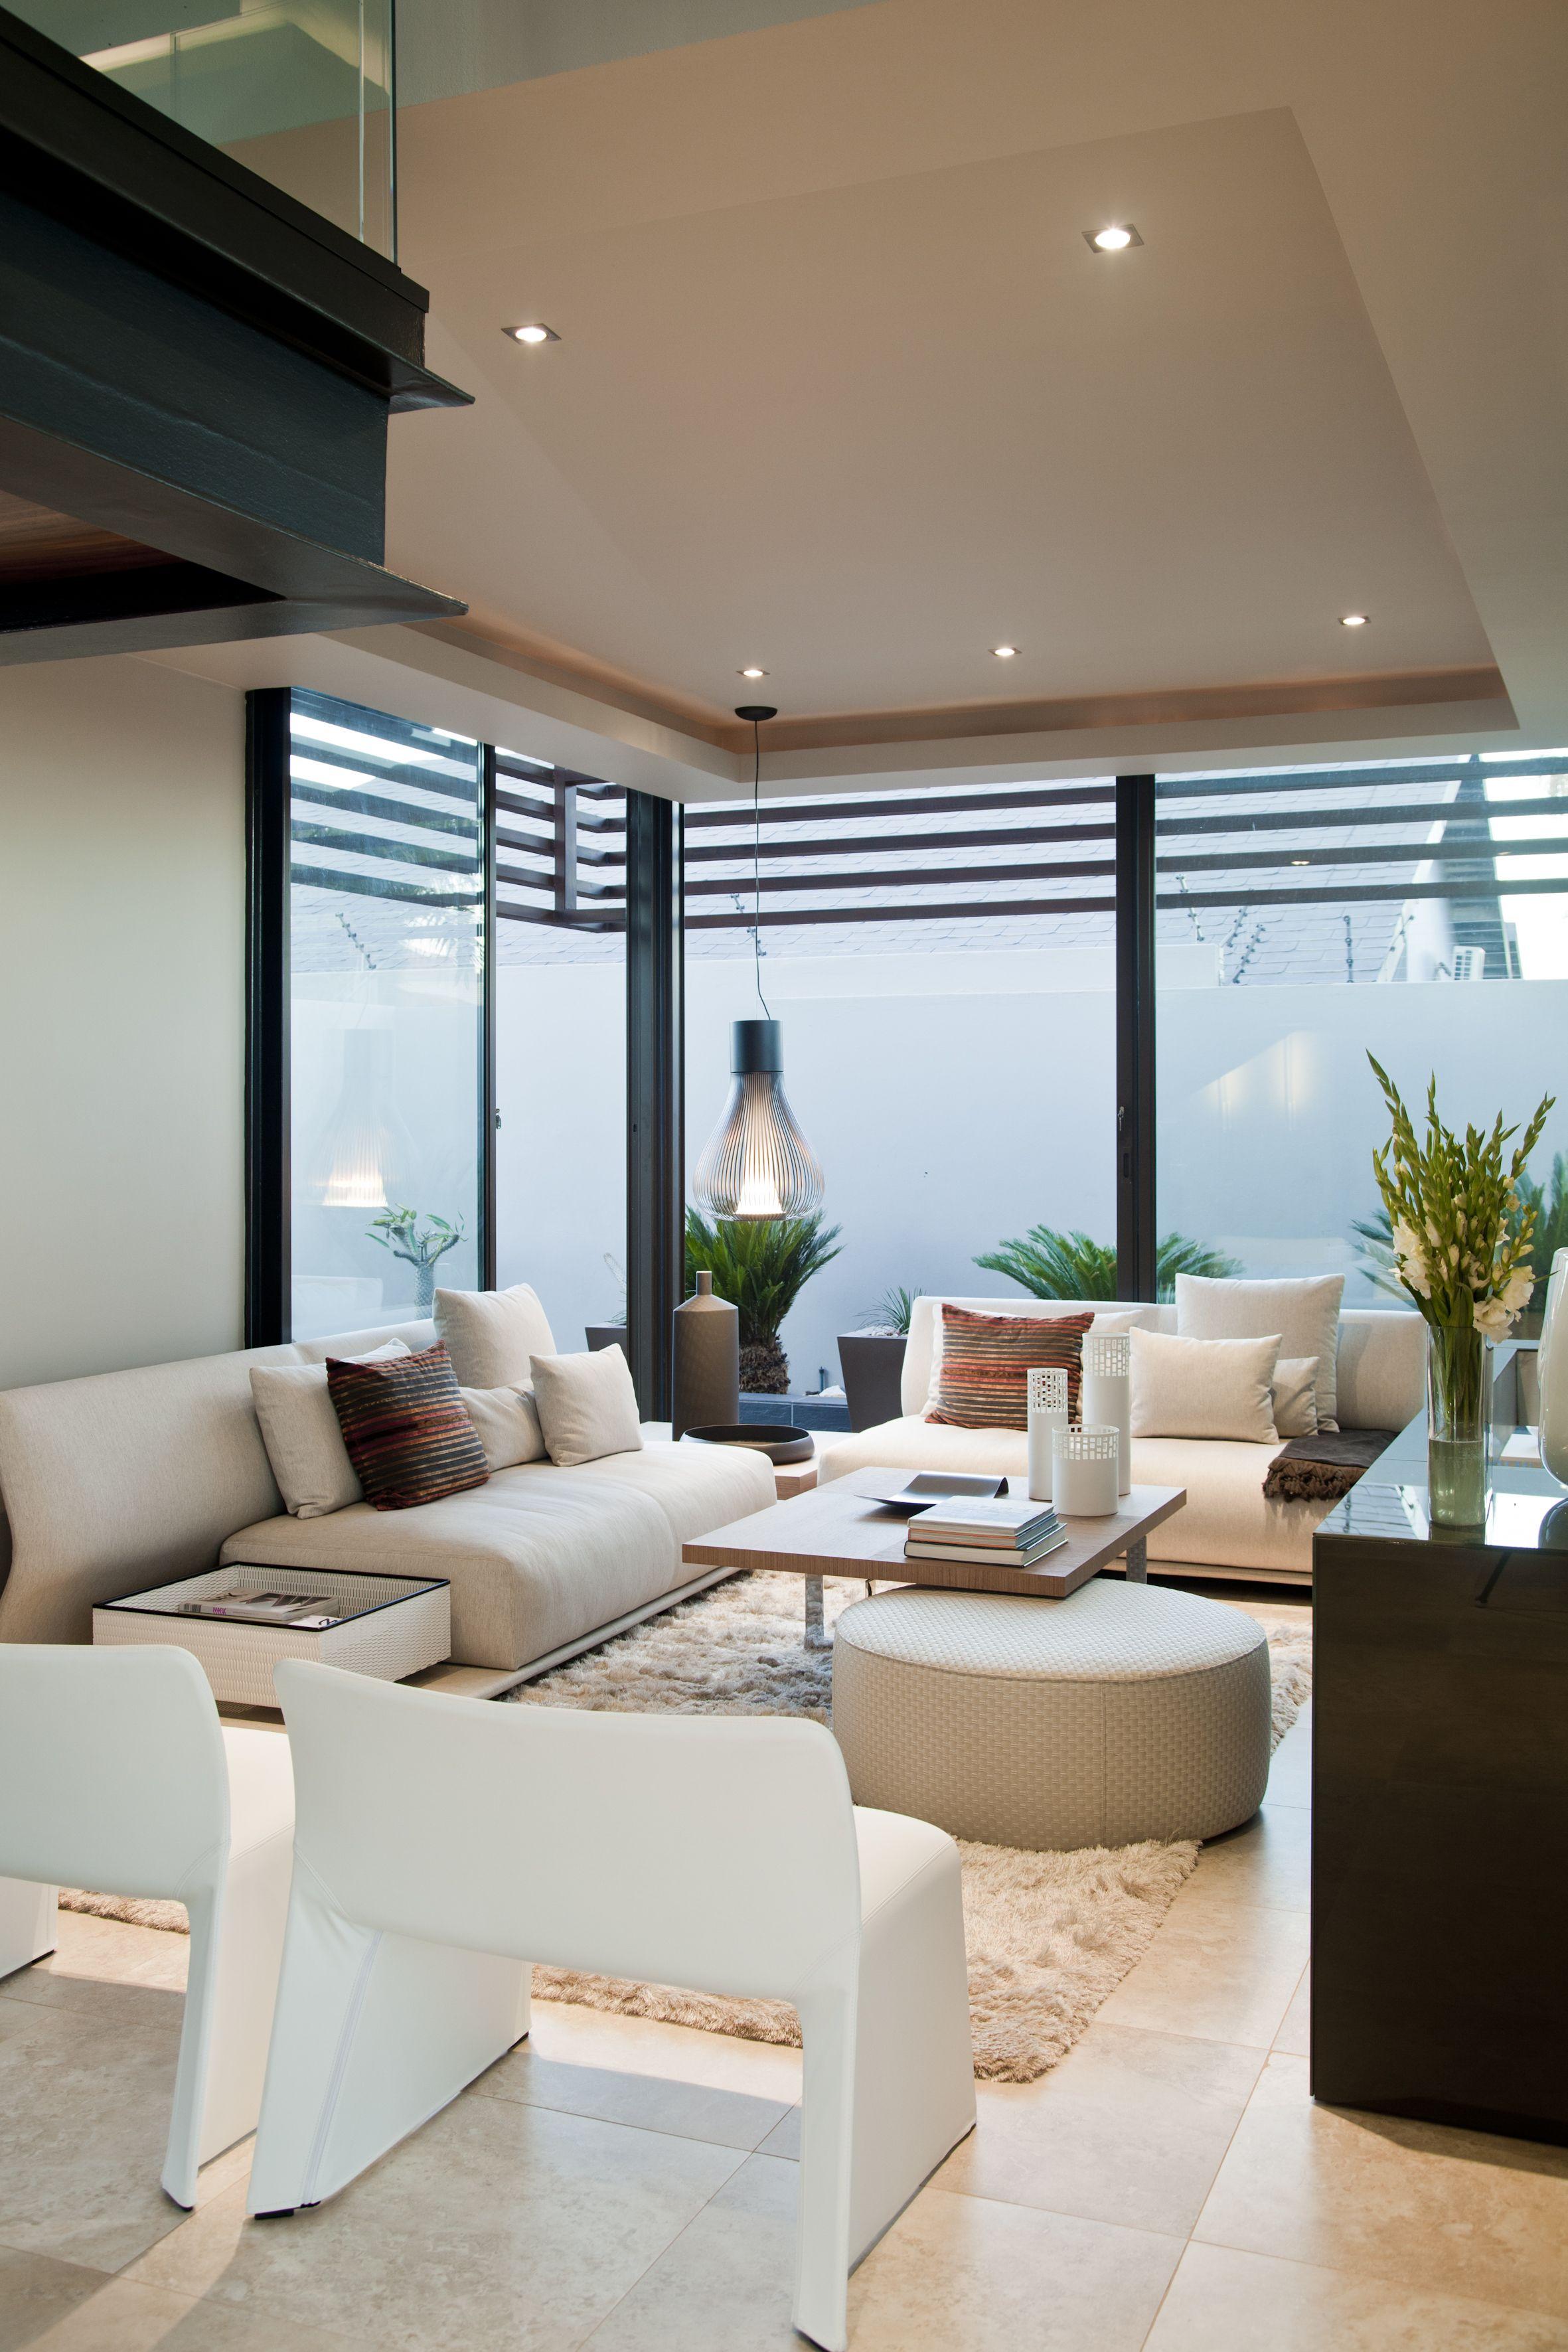 House Abo Living M Square Lifestyle Design M Square  # Neat Muebles Merida